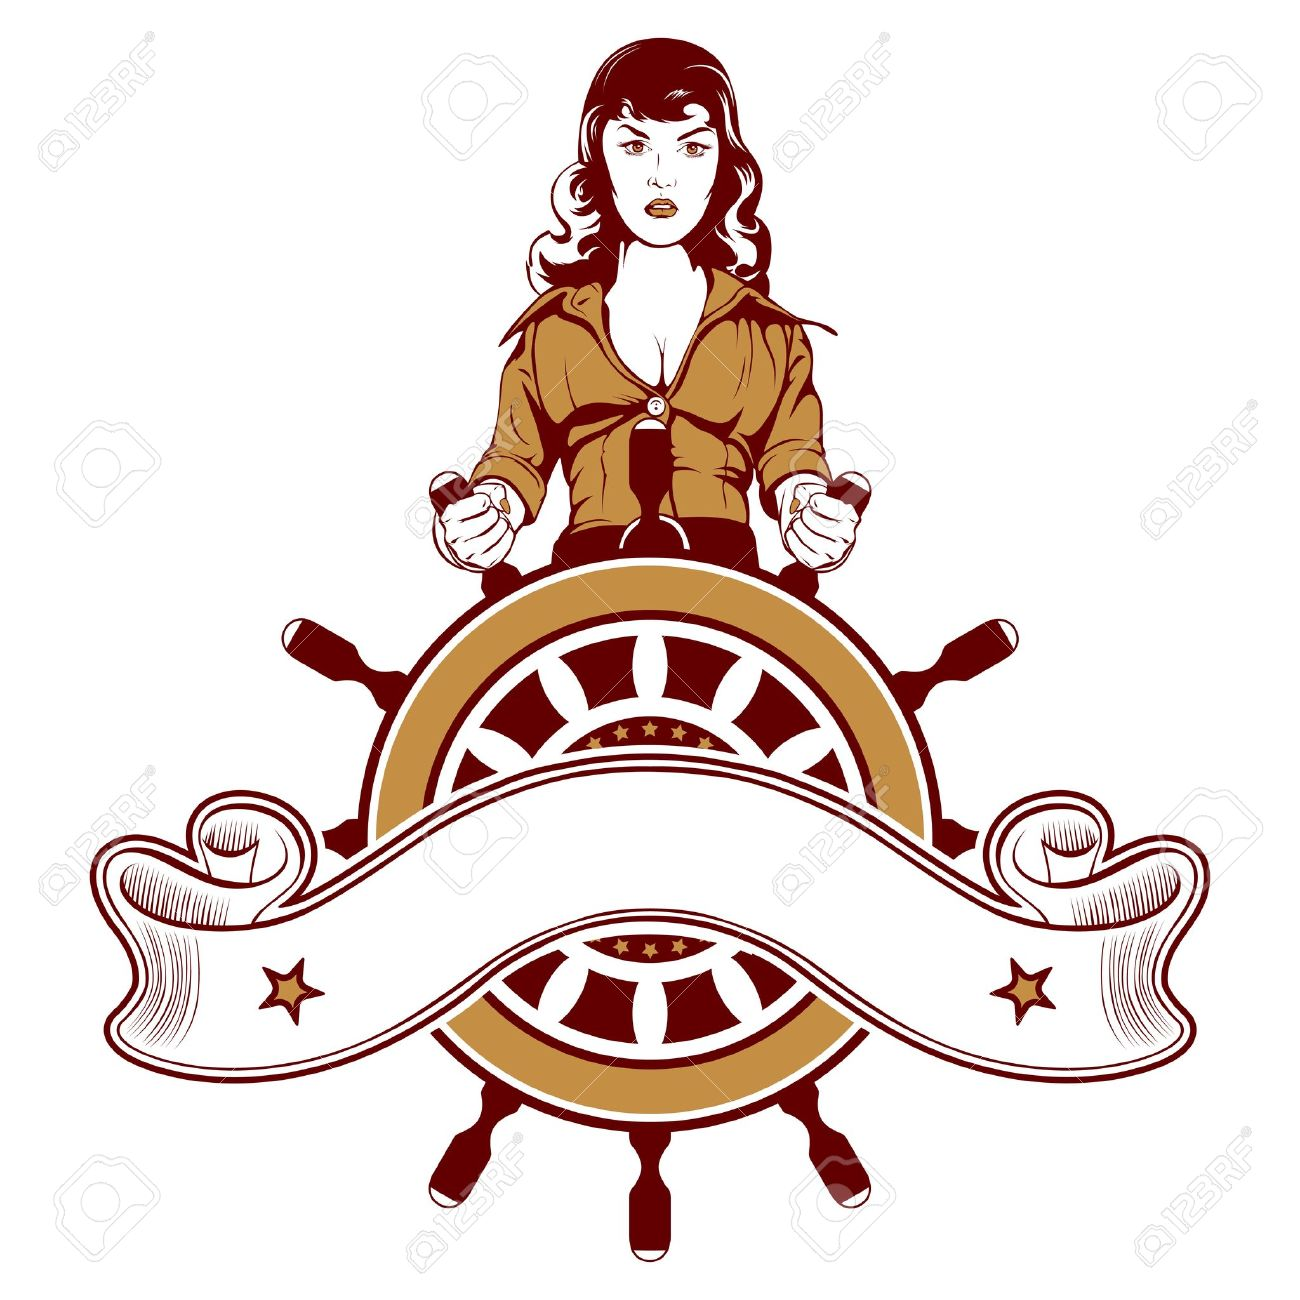 cartoon woman sailor vector emblem - 13305694